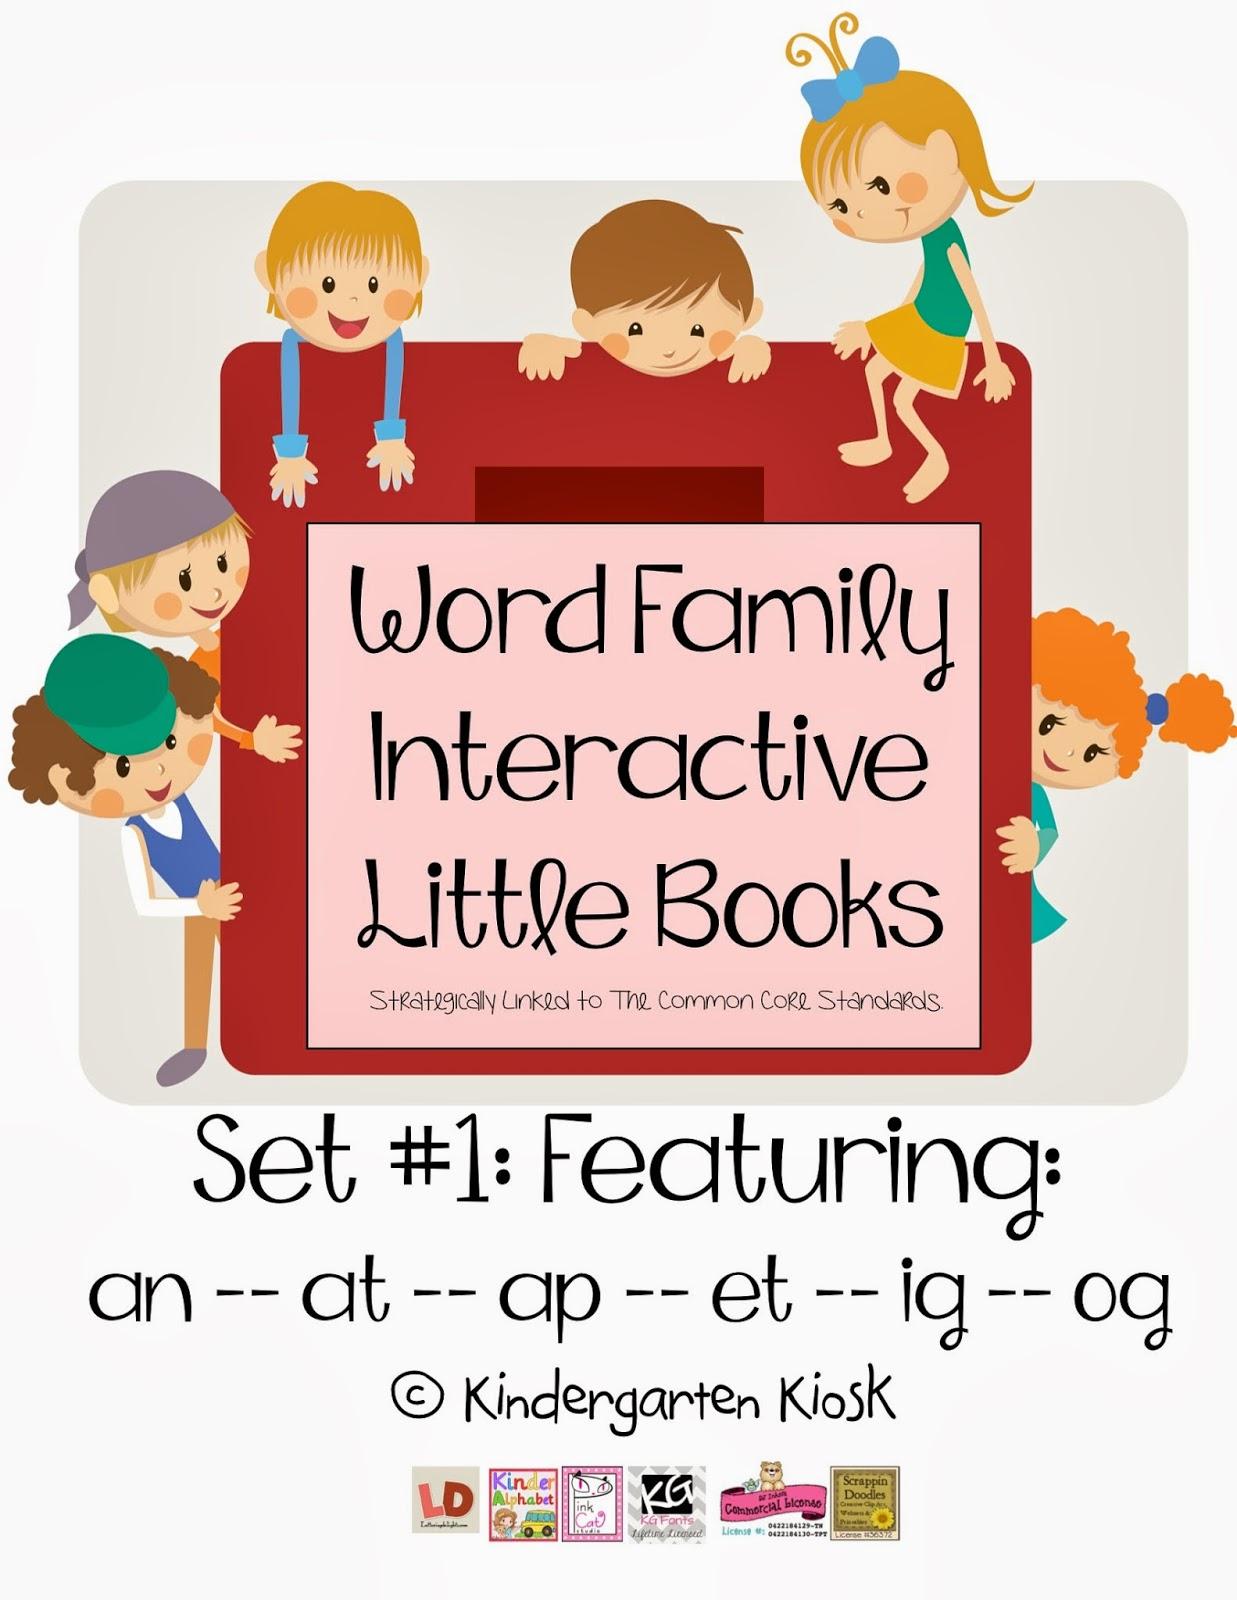 Kindergarten Kiosk Word Family Interactive Little Books